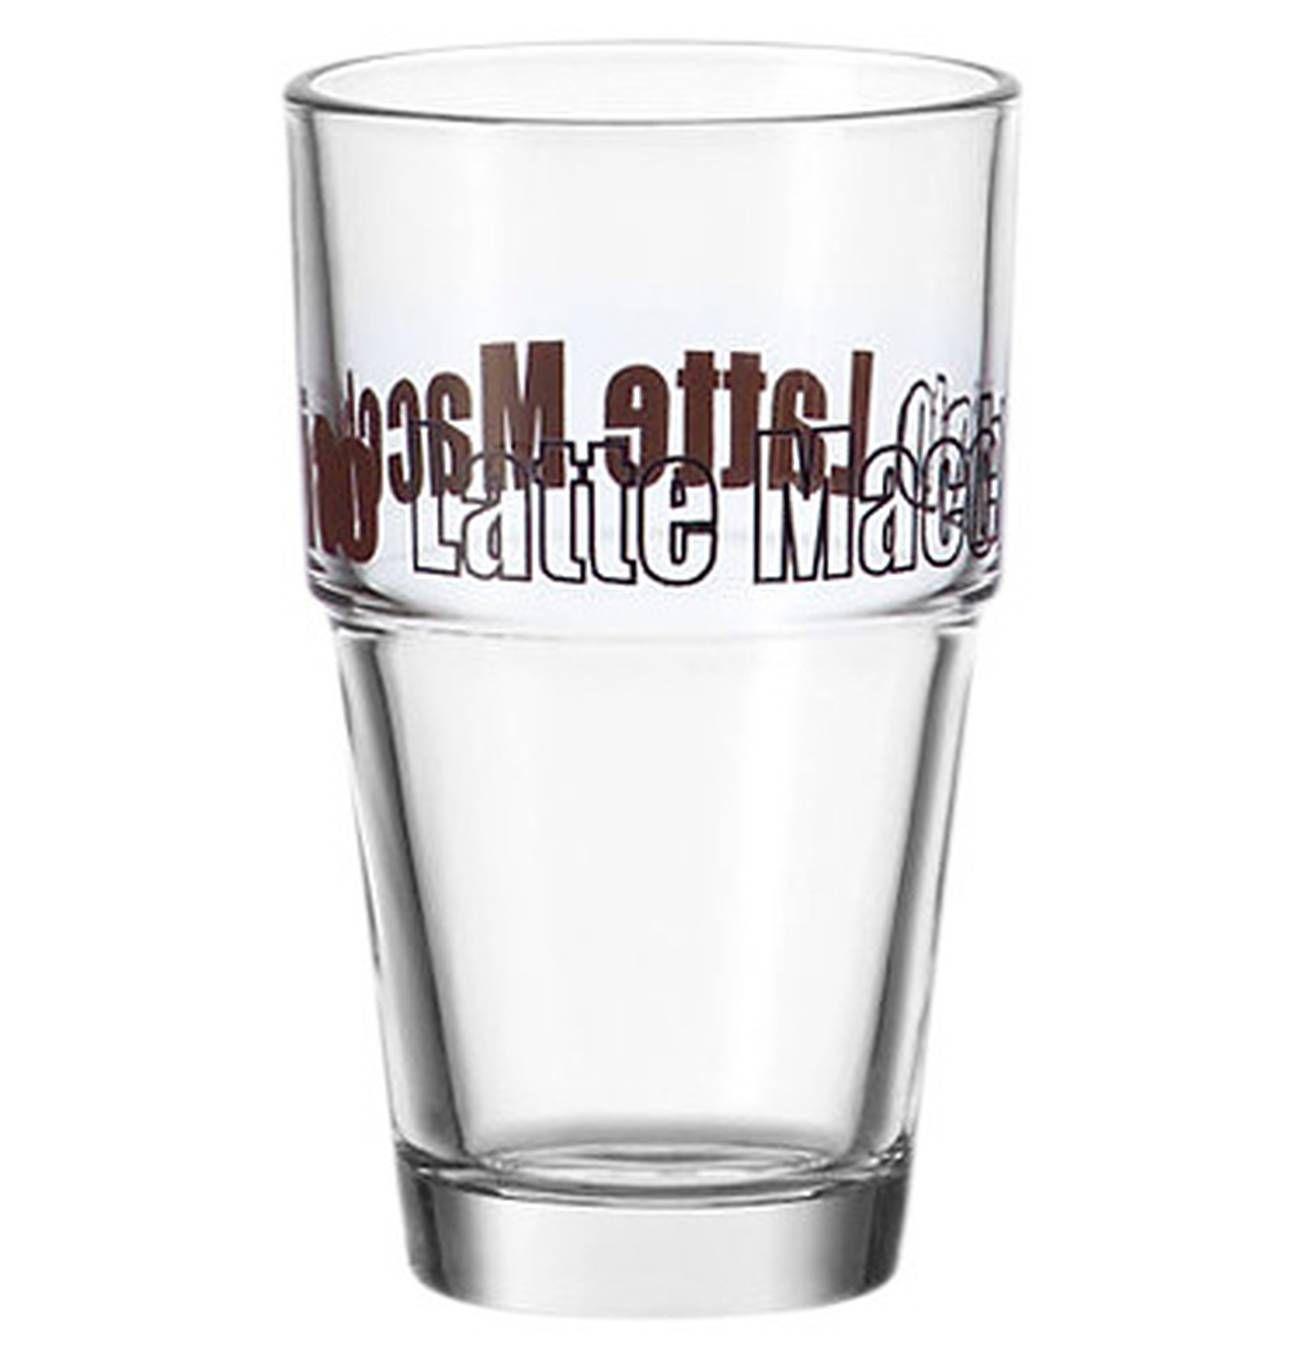 LEONARDO Solo Latte Macchiato- Becher #lattemacchiato